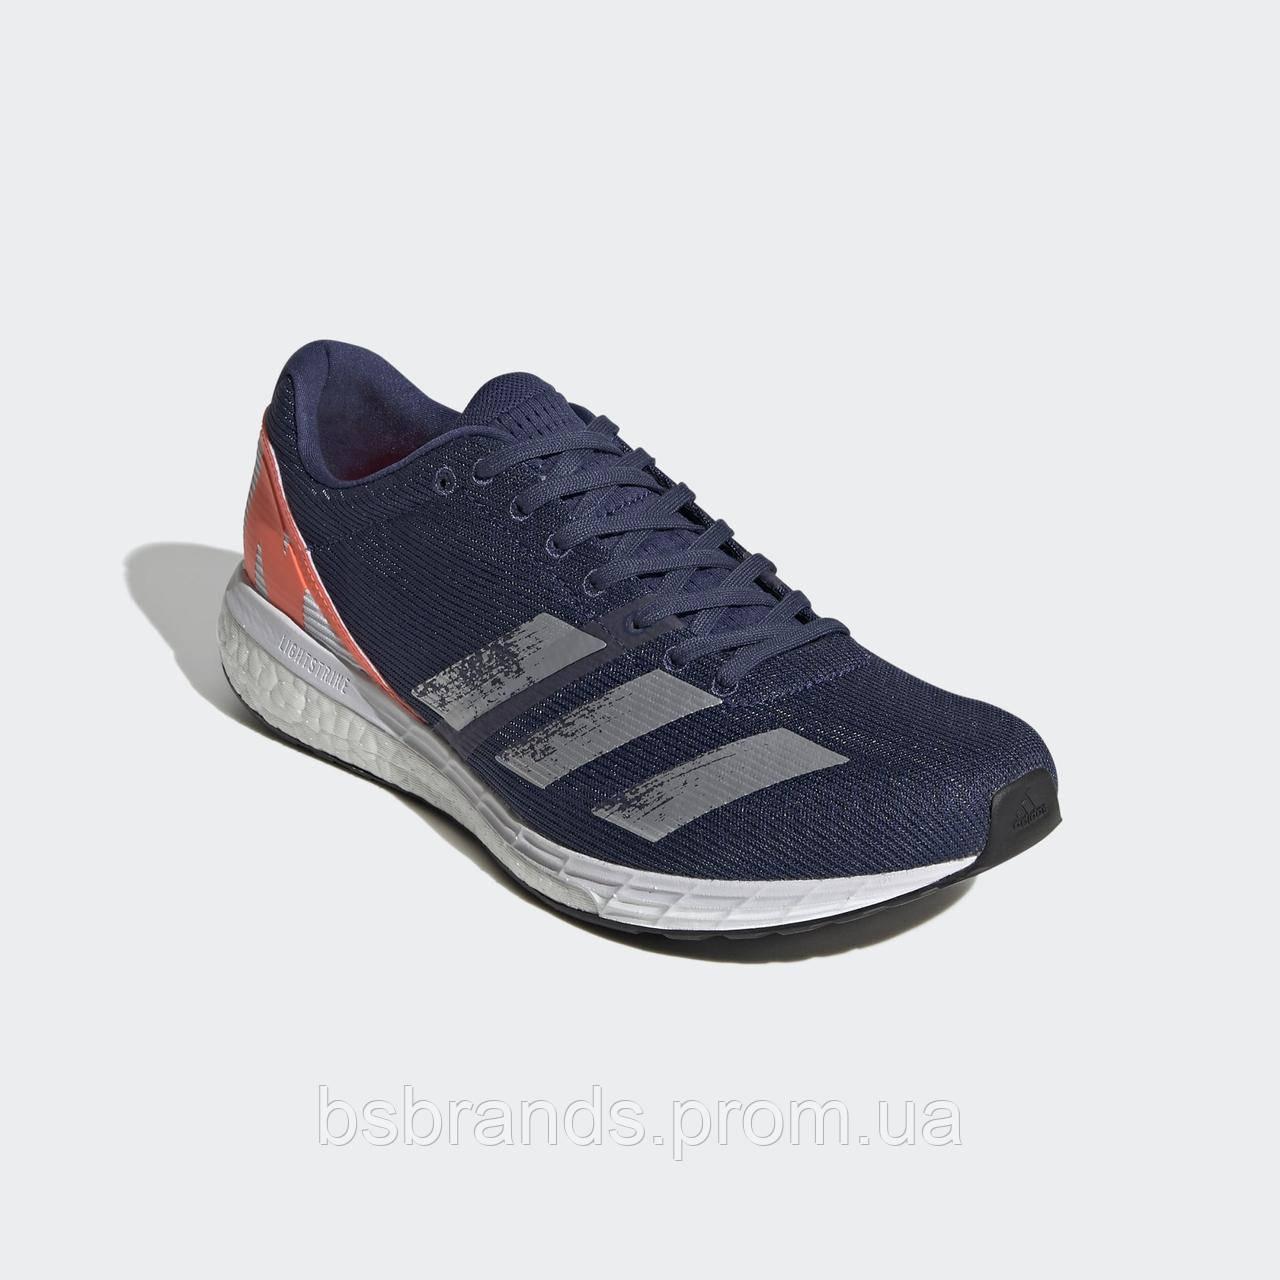 Мужские кроссовки adidas для бега Adizero Boston 8 EG6639 (2020\1)